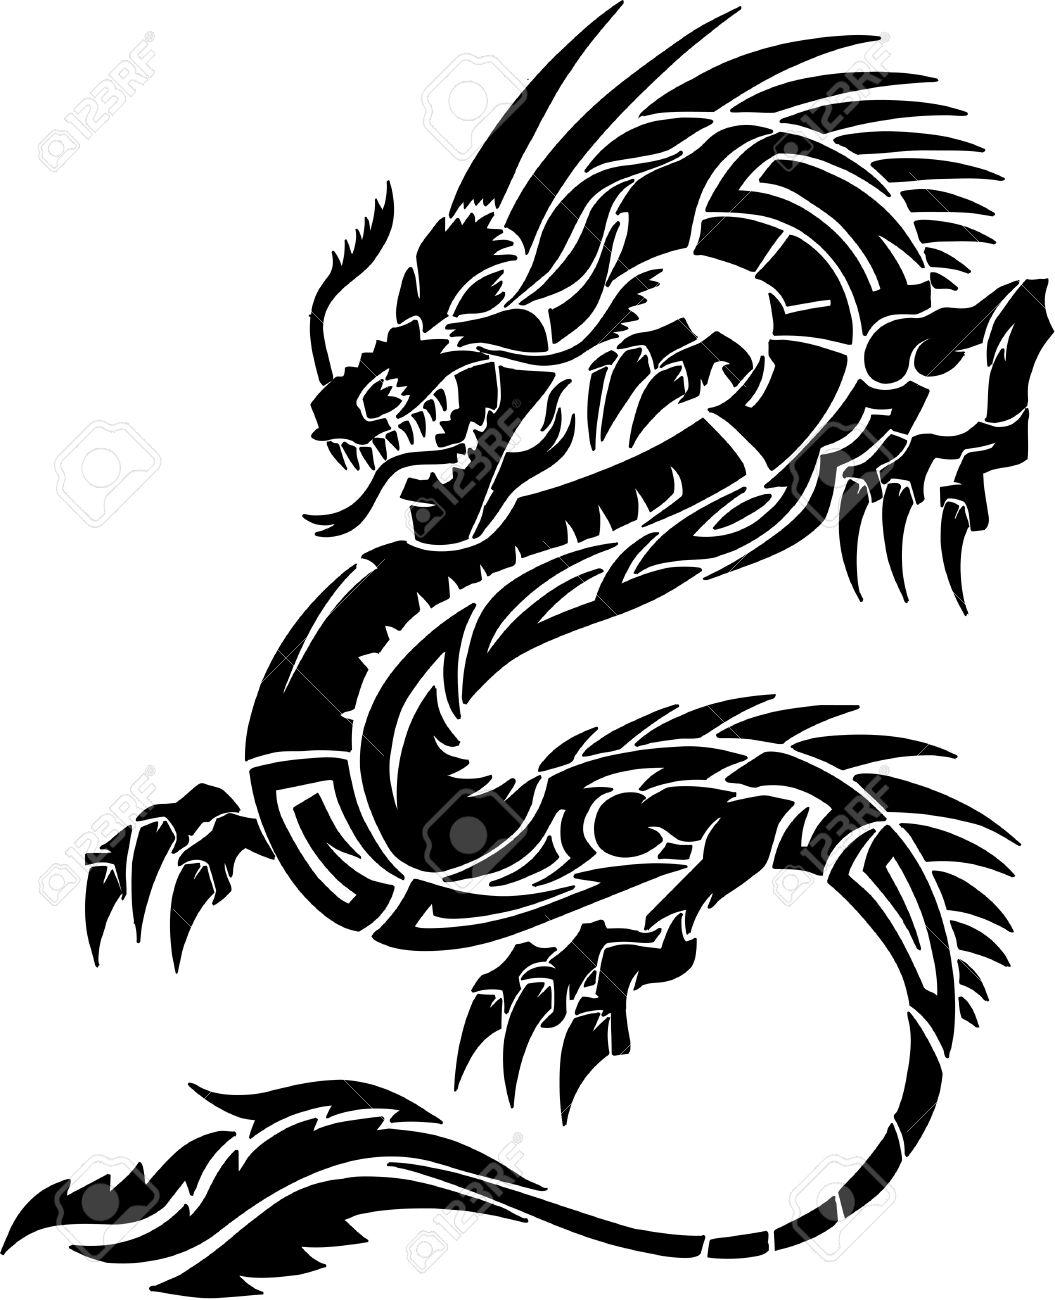 tribal tattoo dragon vector illustration royalty free cliparts rh 123rf com vector dragon silhouette vector dragon head